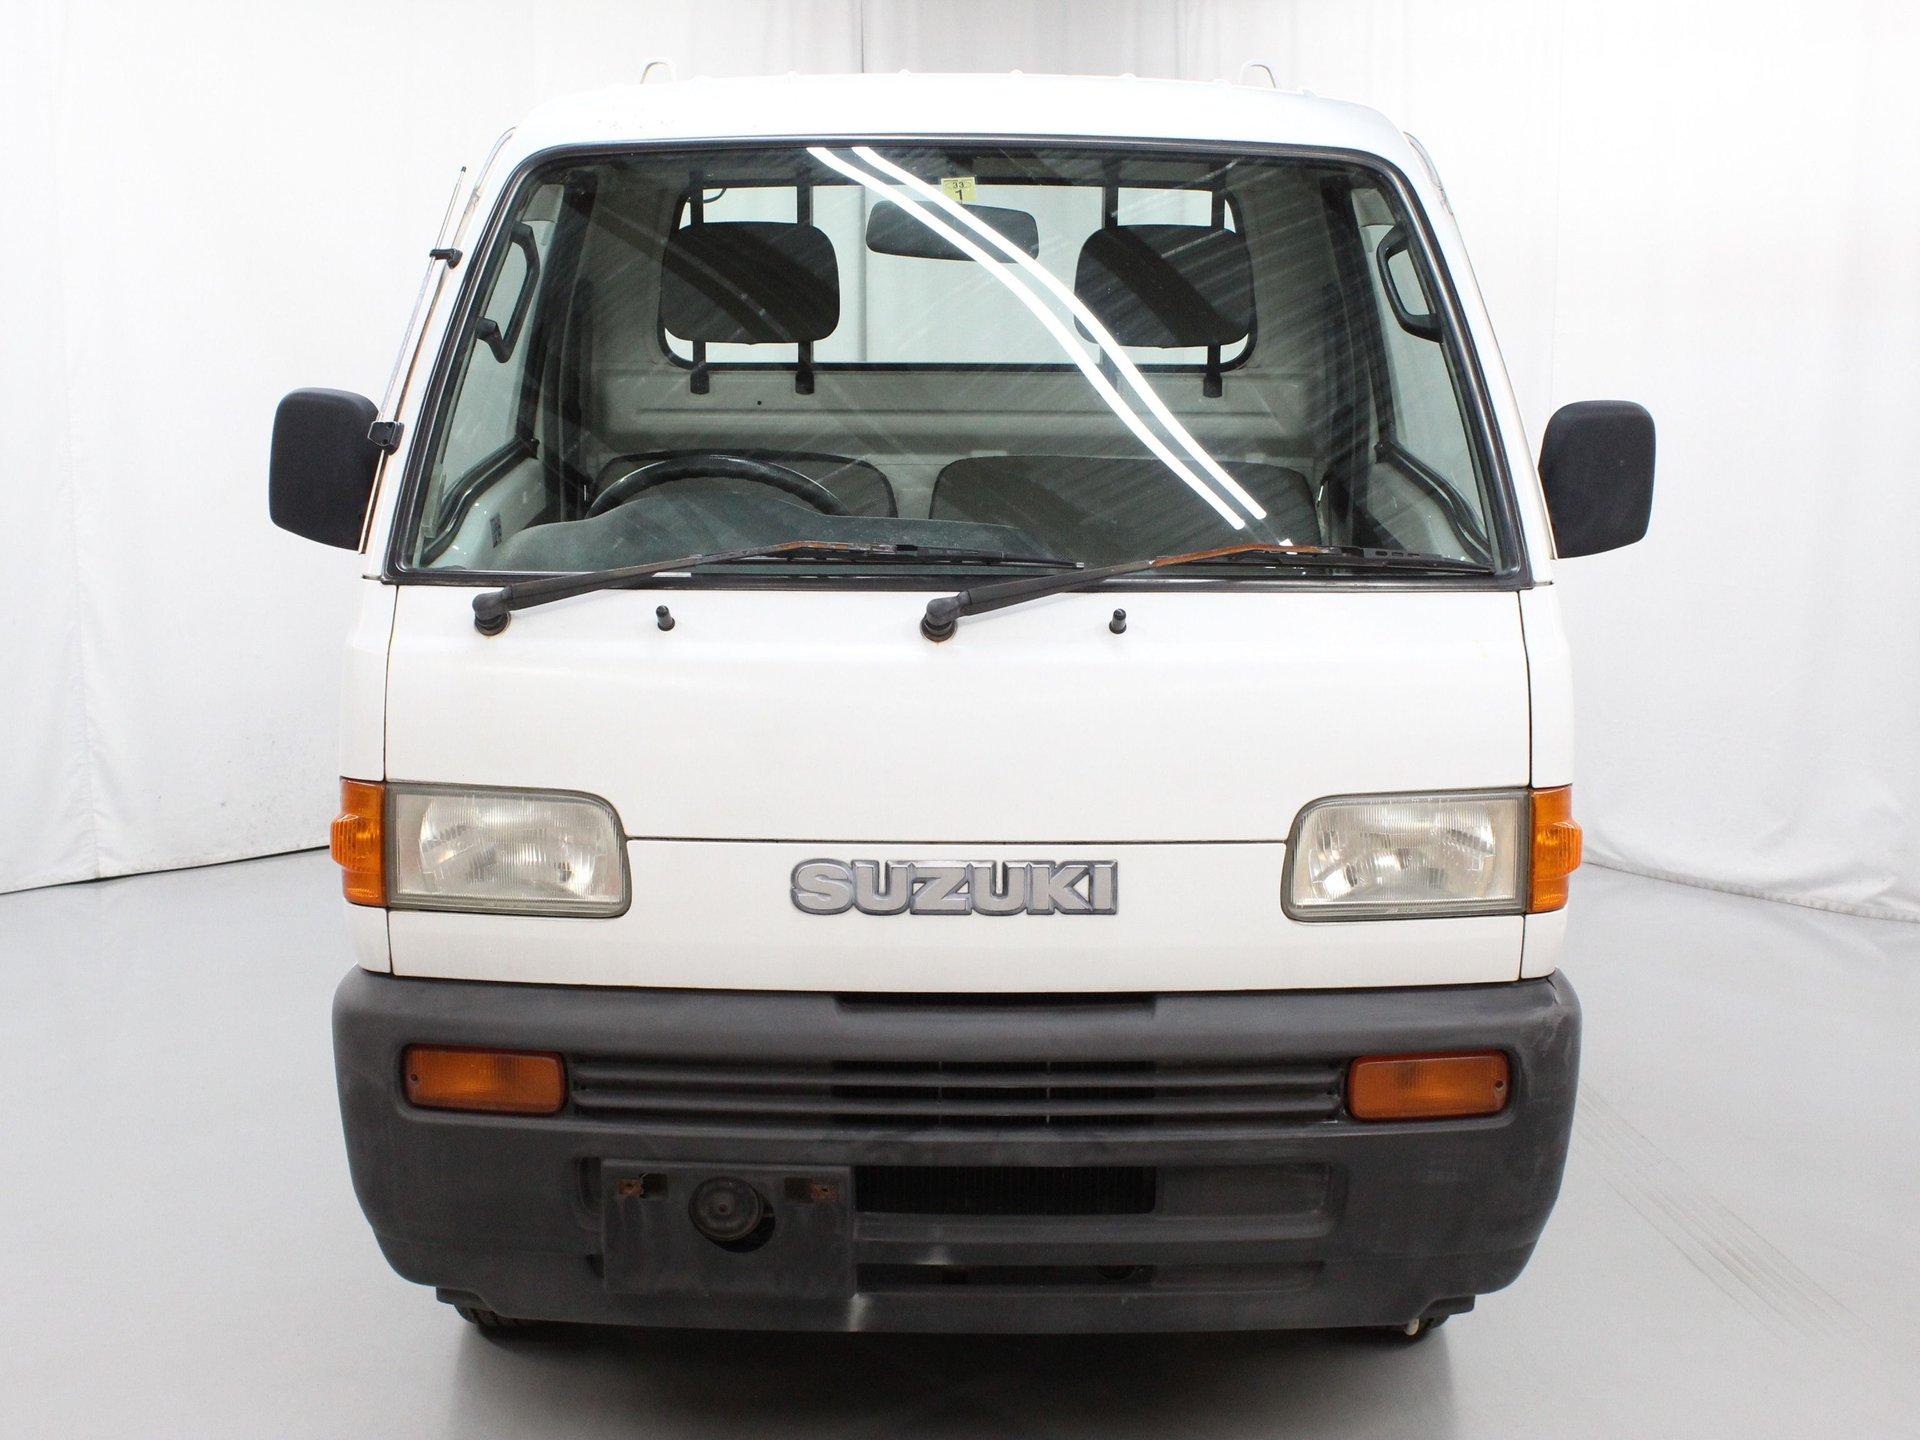 1996 Suzuki Carry